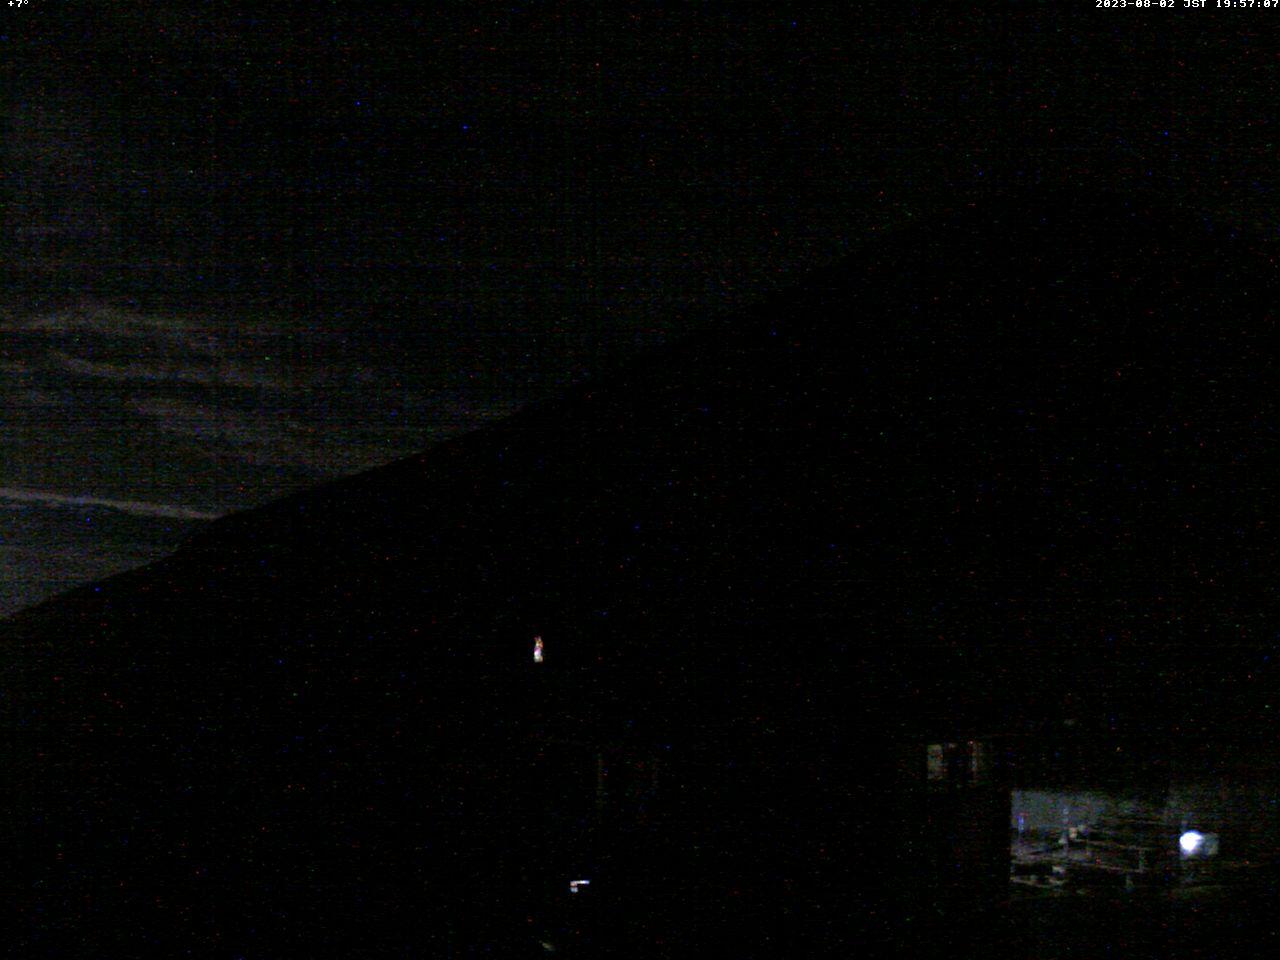 富士山ライブカメラ-富士市茶畑望遠(葛飾北斎視点)